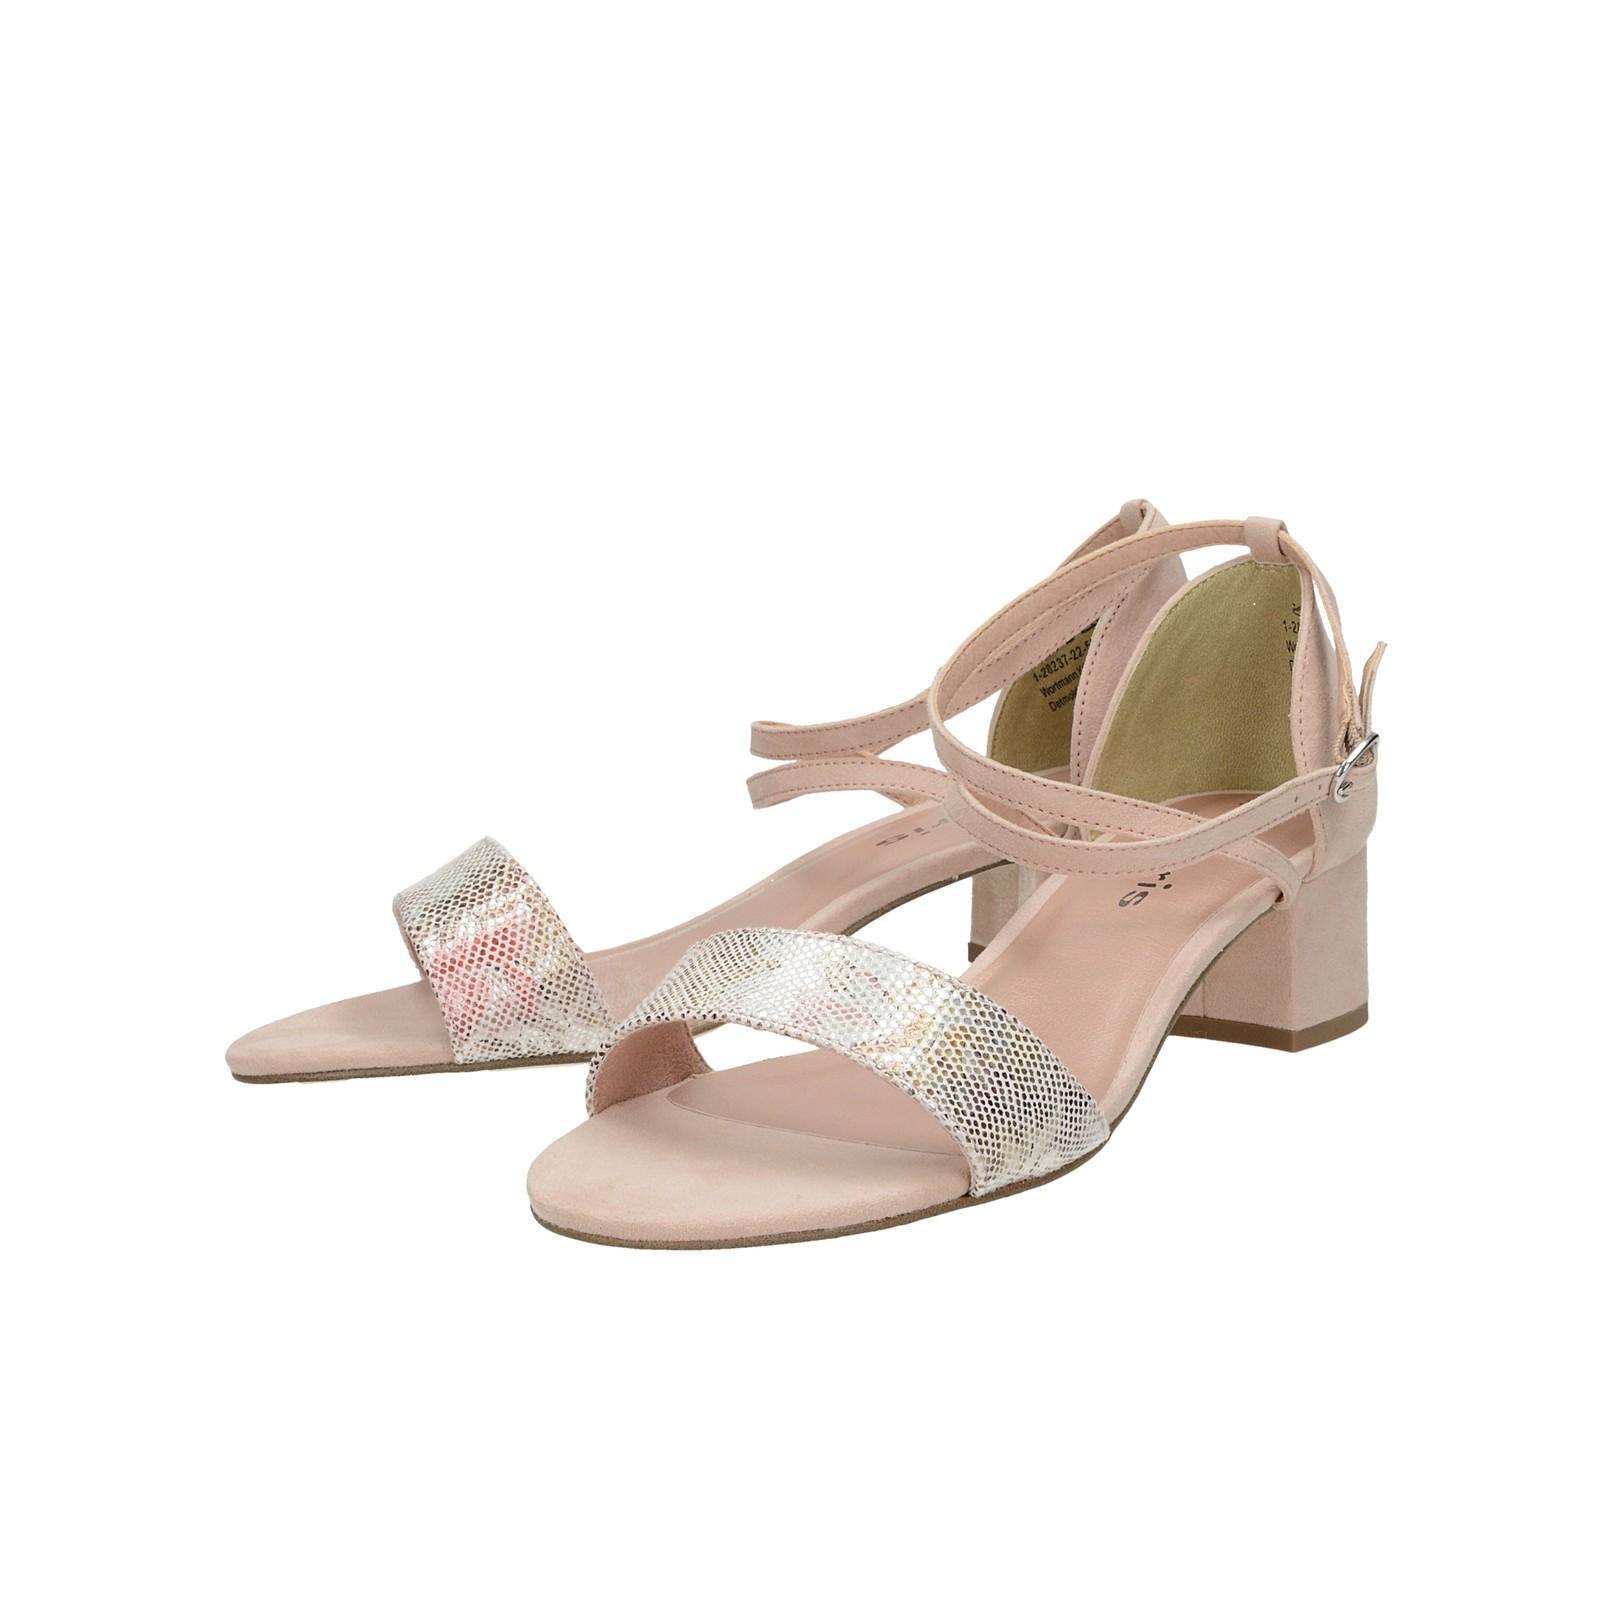 5ef22edfa8 ... Tamaris dámske pohodlné sandále - ružové ...